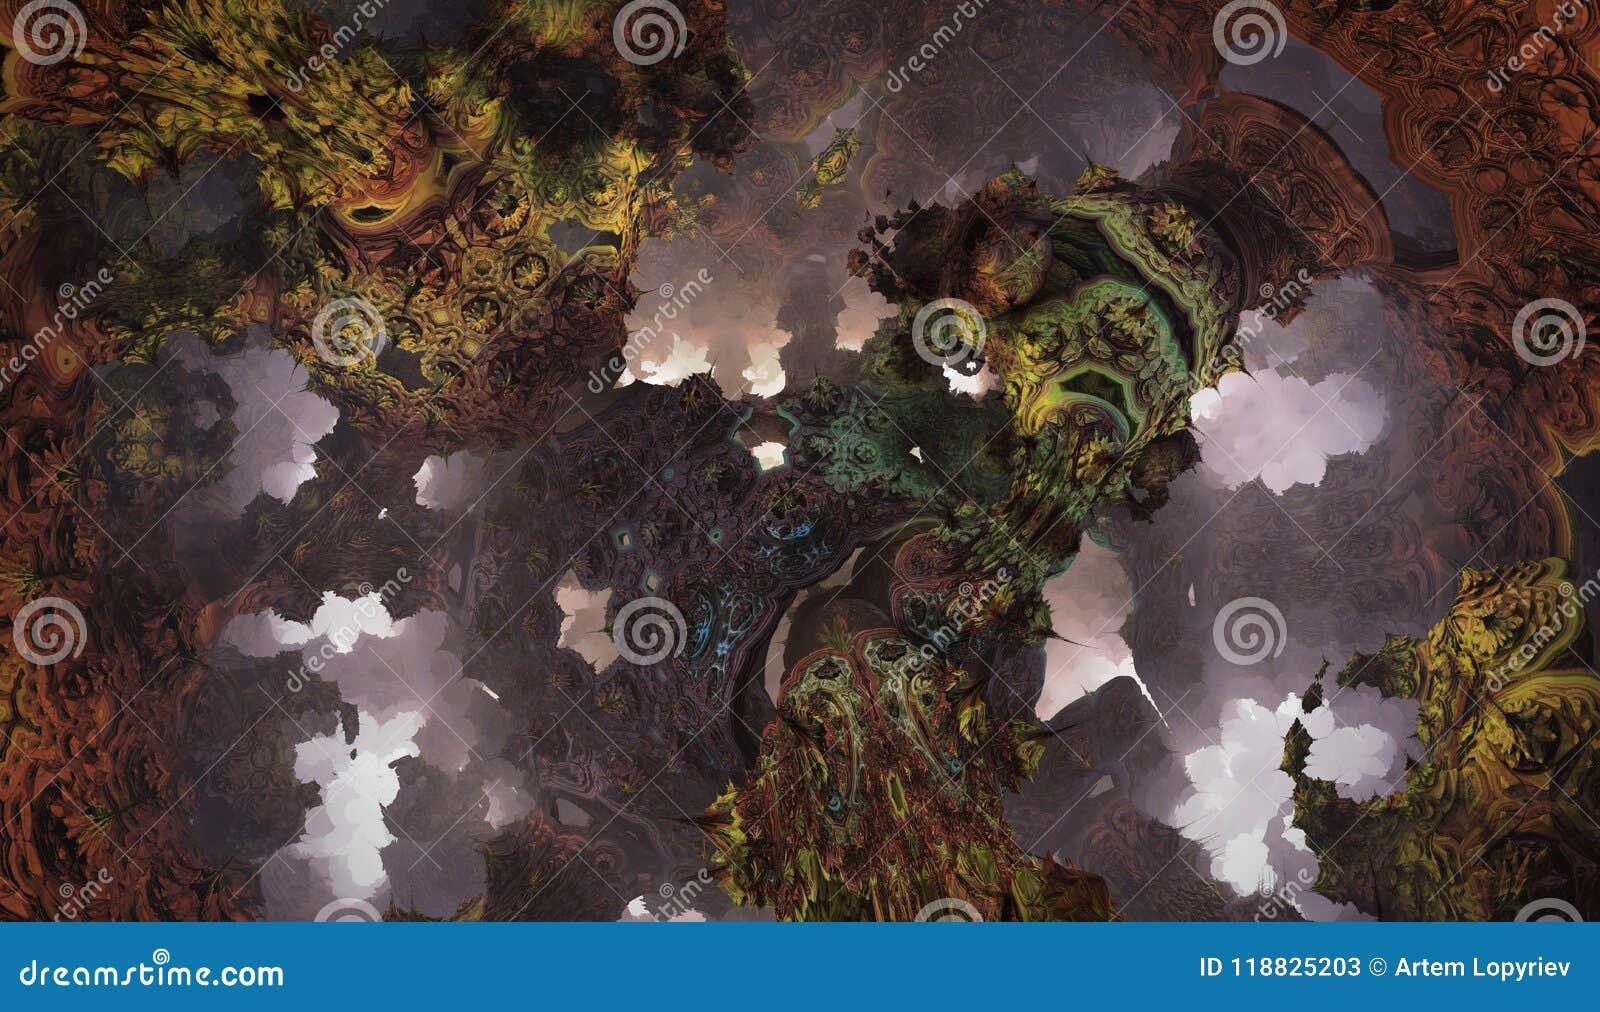 Cartel o fondo fantástico abstracto Vista futurista desde adentro del fractal